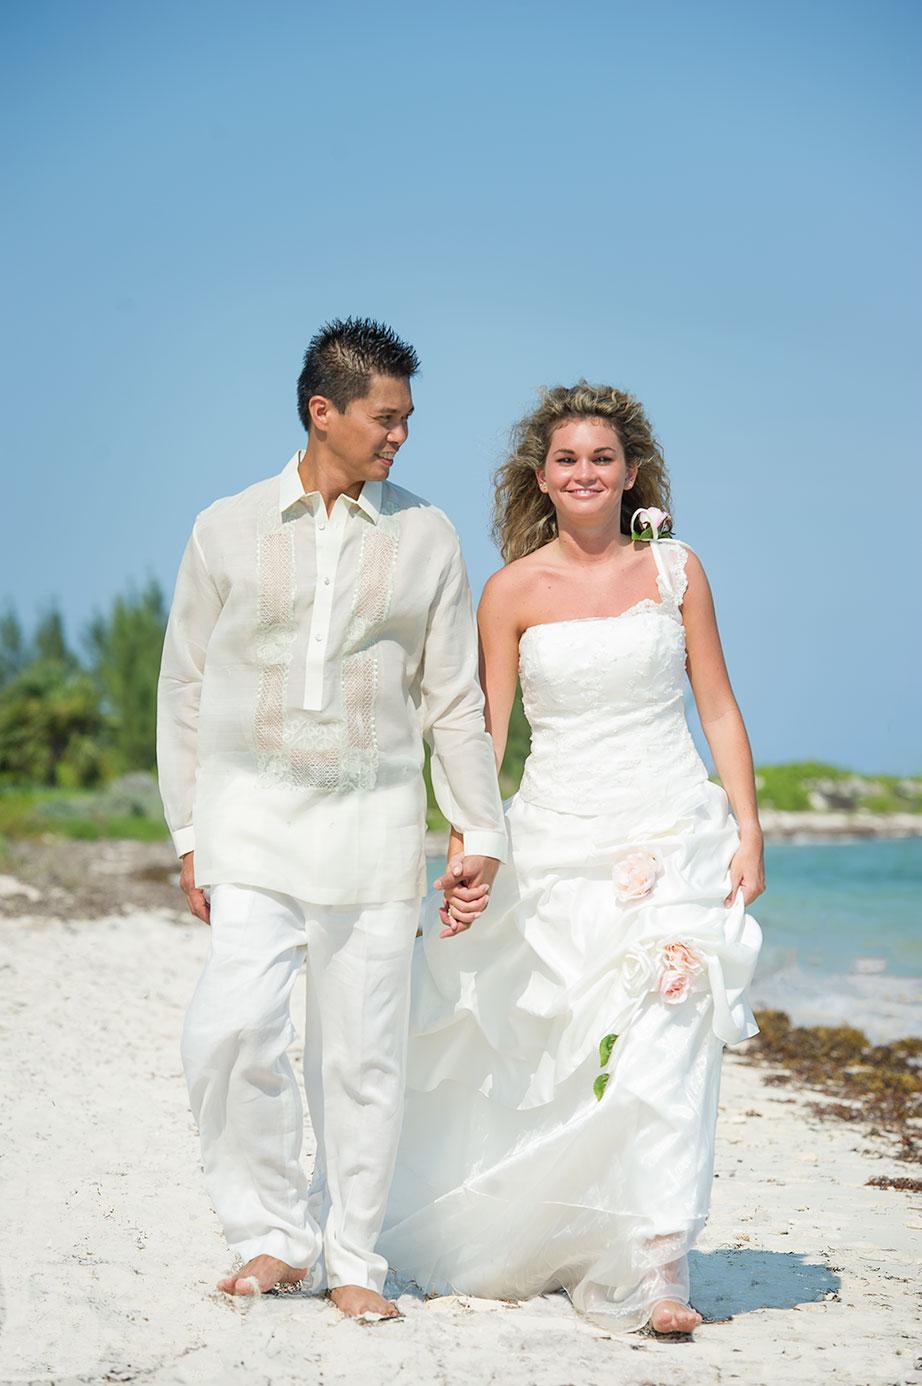 Bahamas Destination Wedding Packages  ChicBahamasWeddings